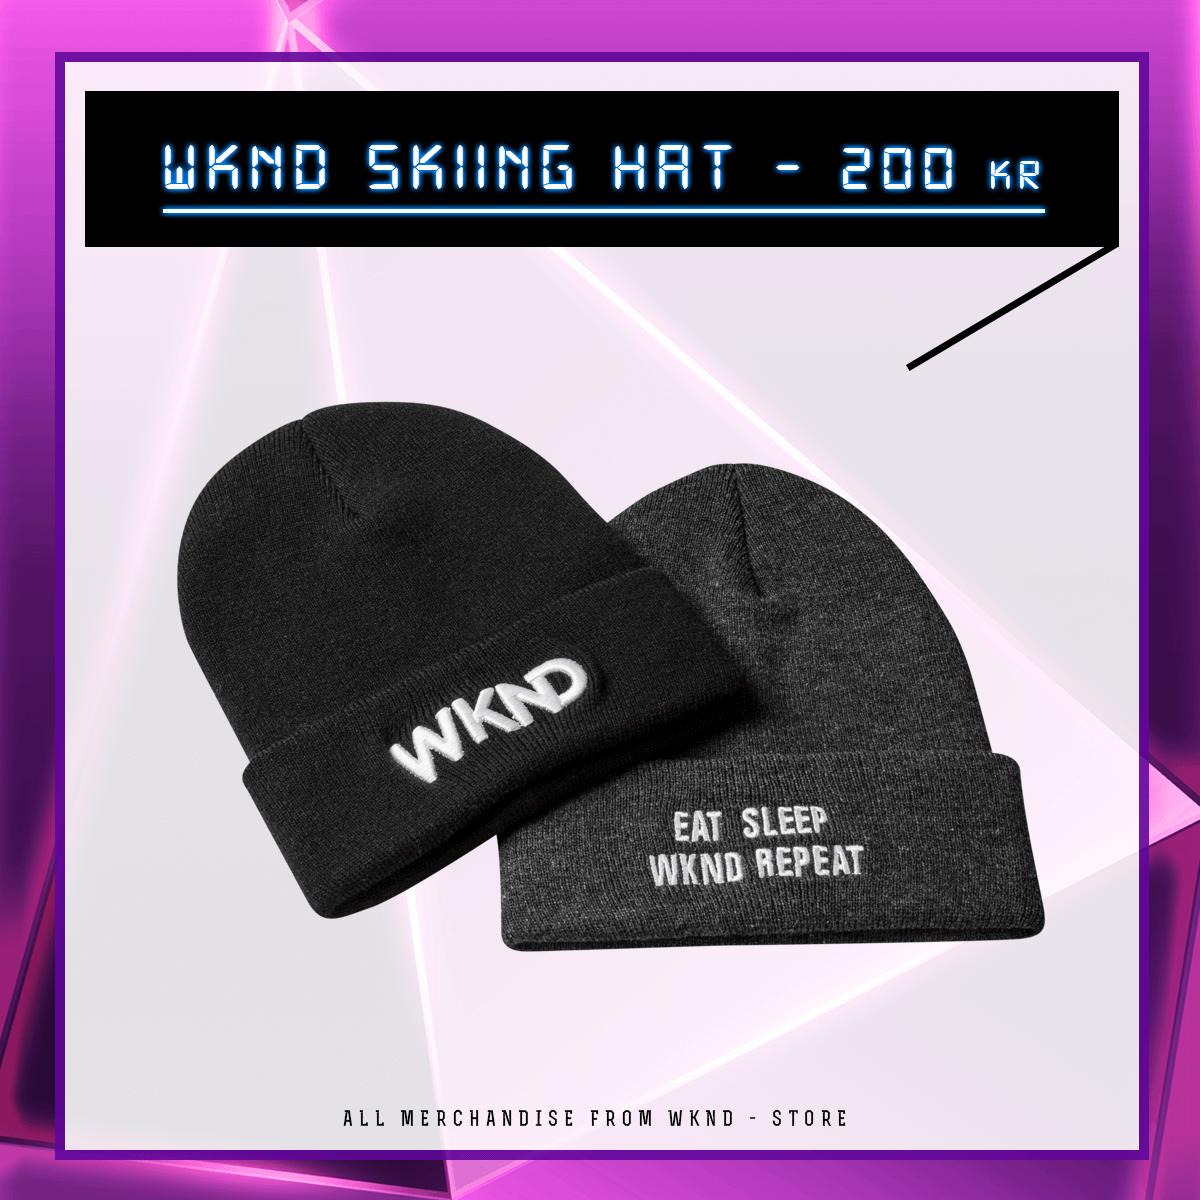 WKND-SKIING-HAT-SWE